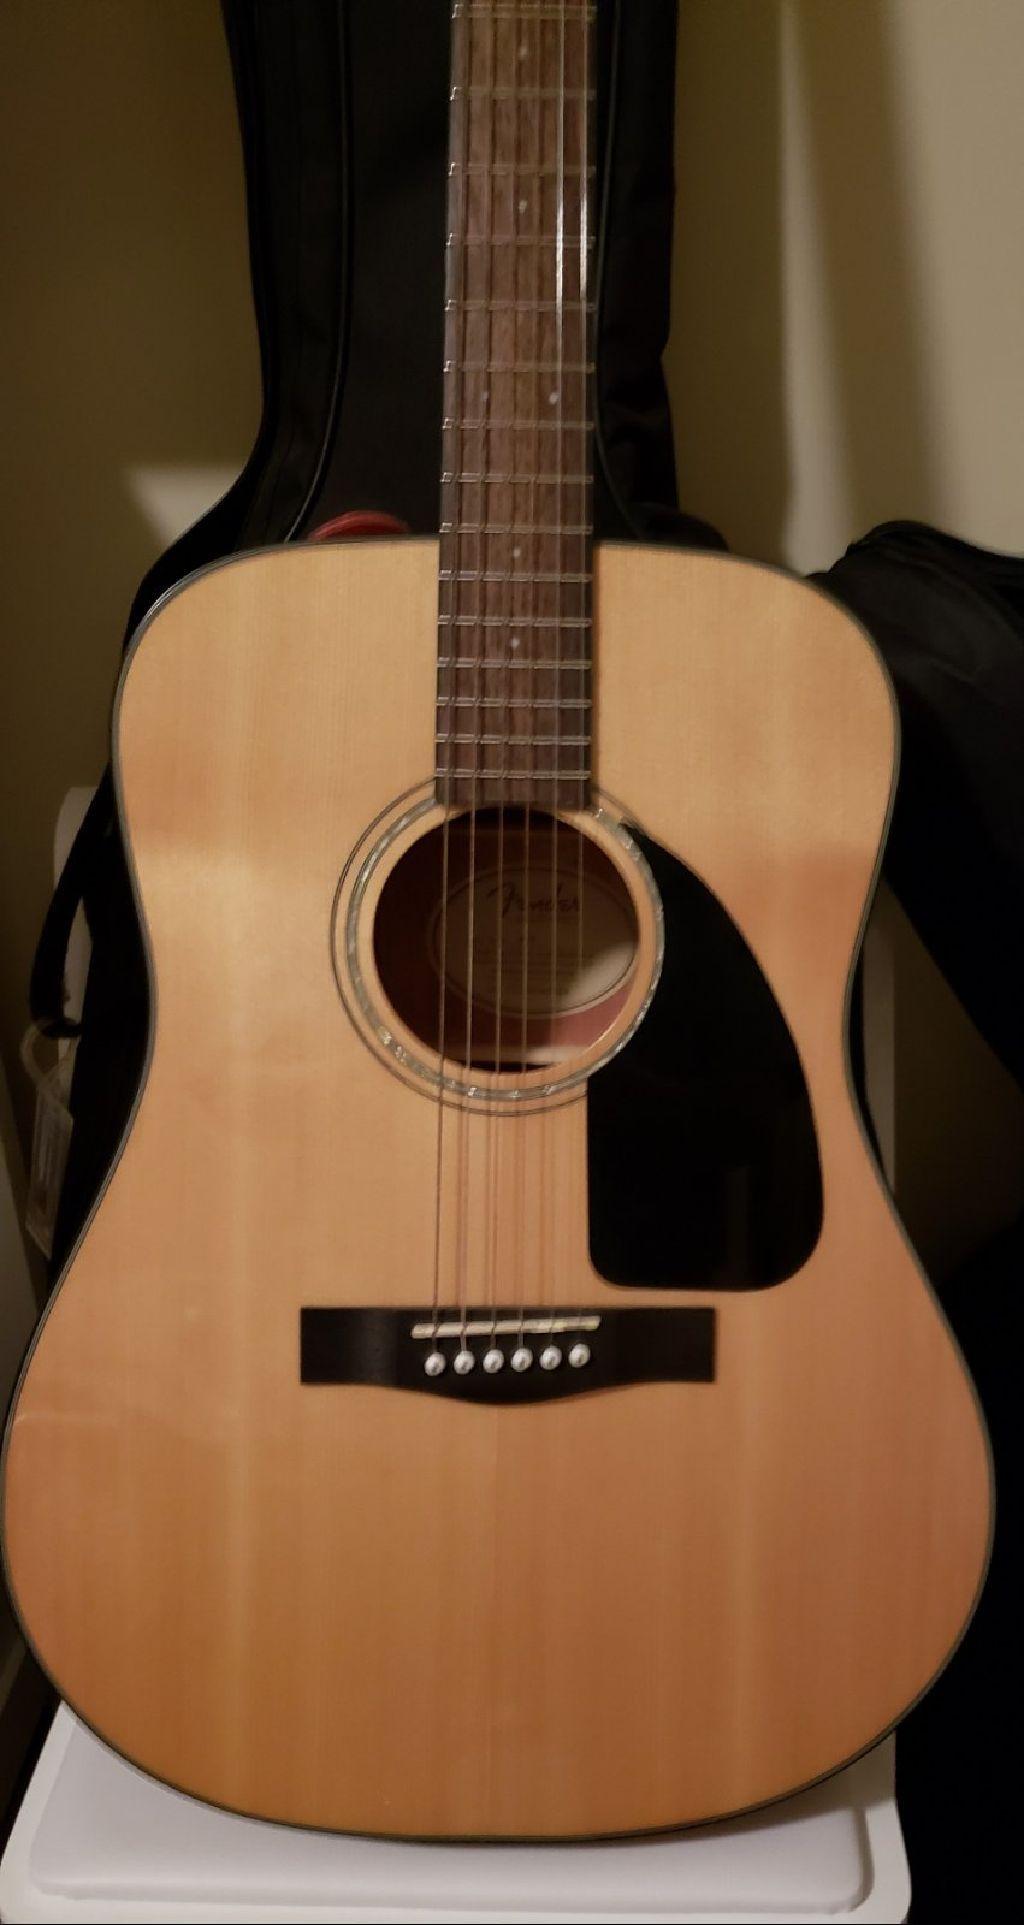 Fender guitar guitar fender guitar fender